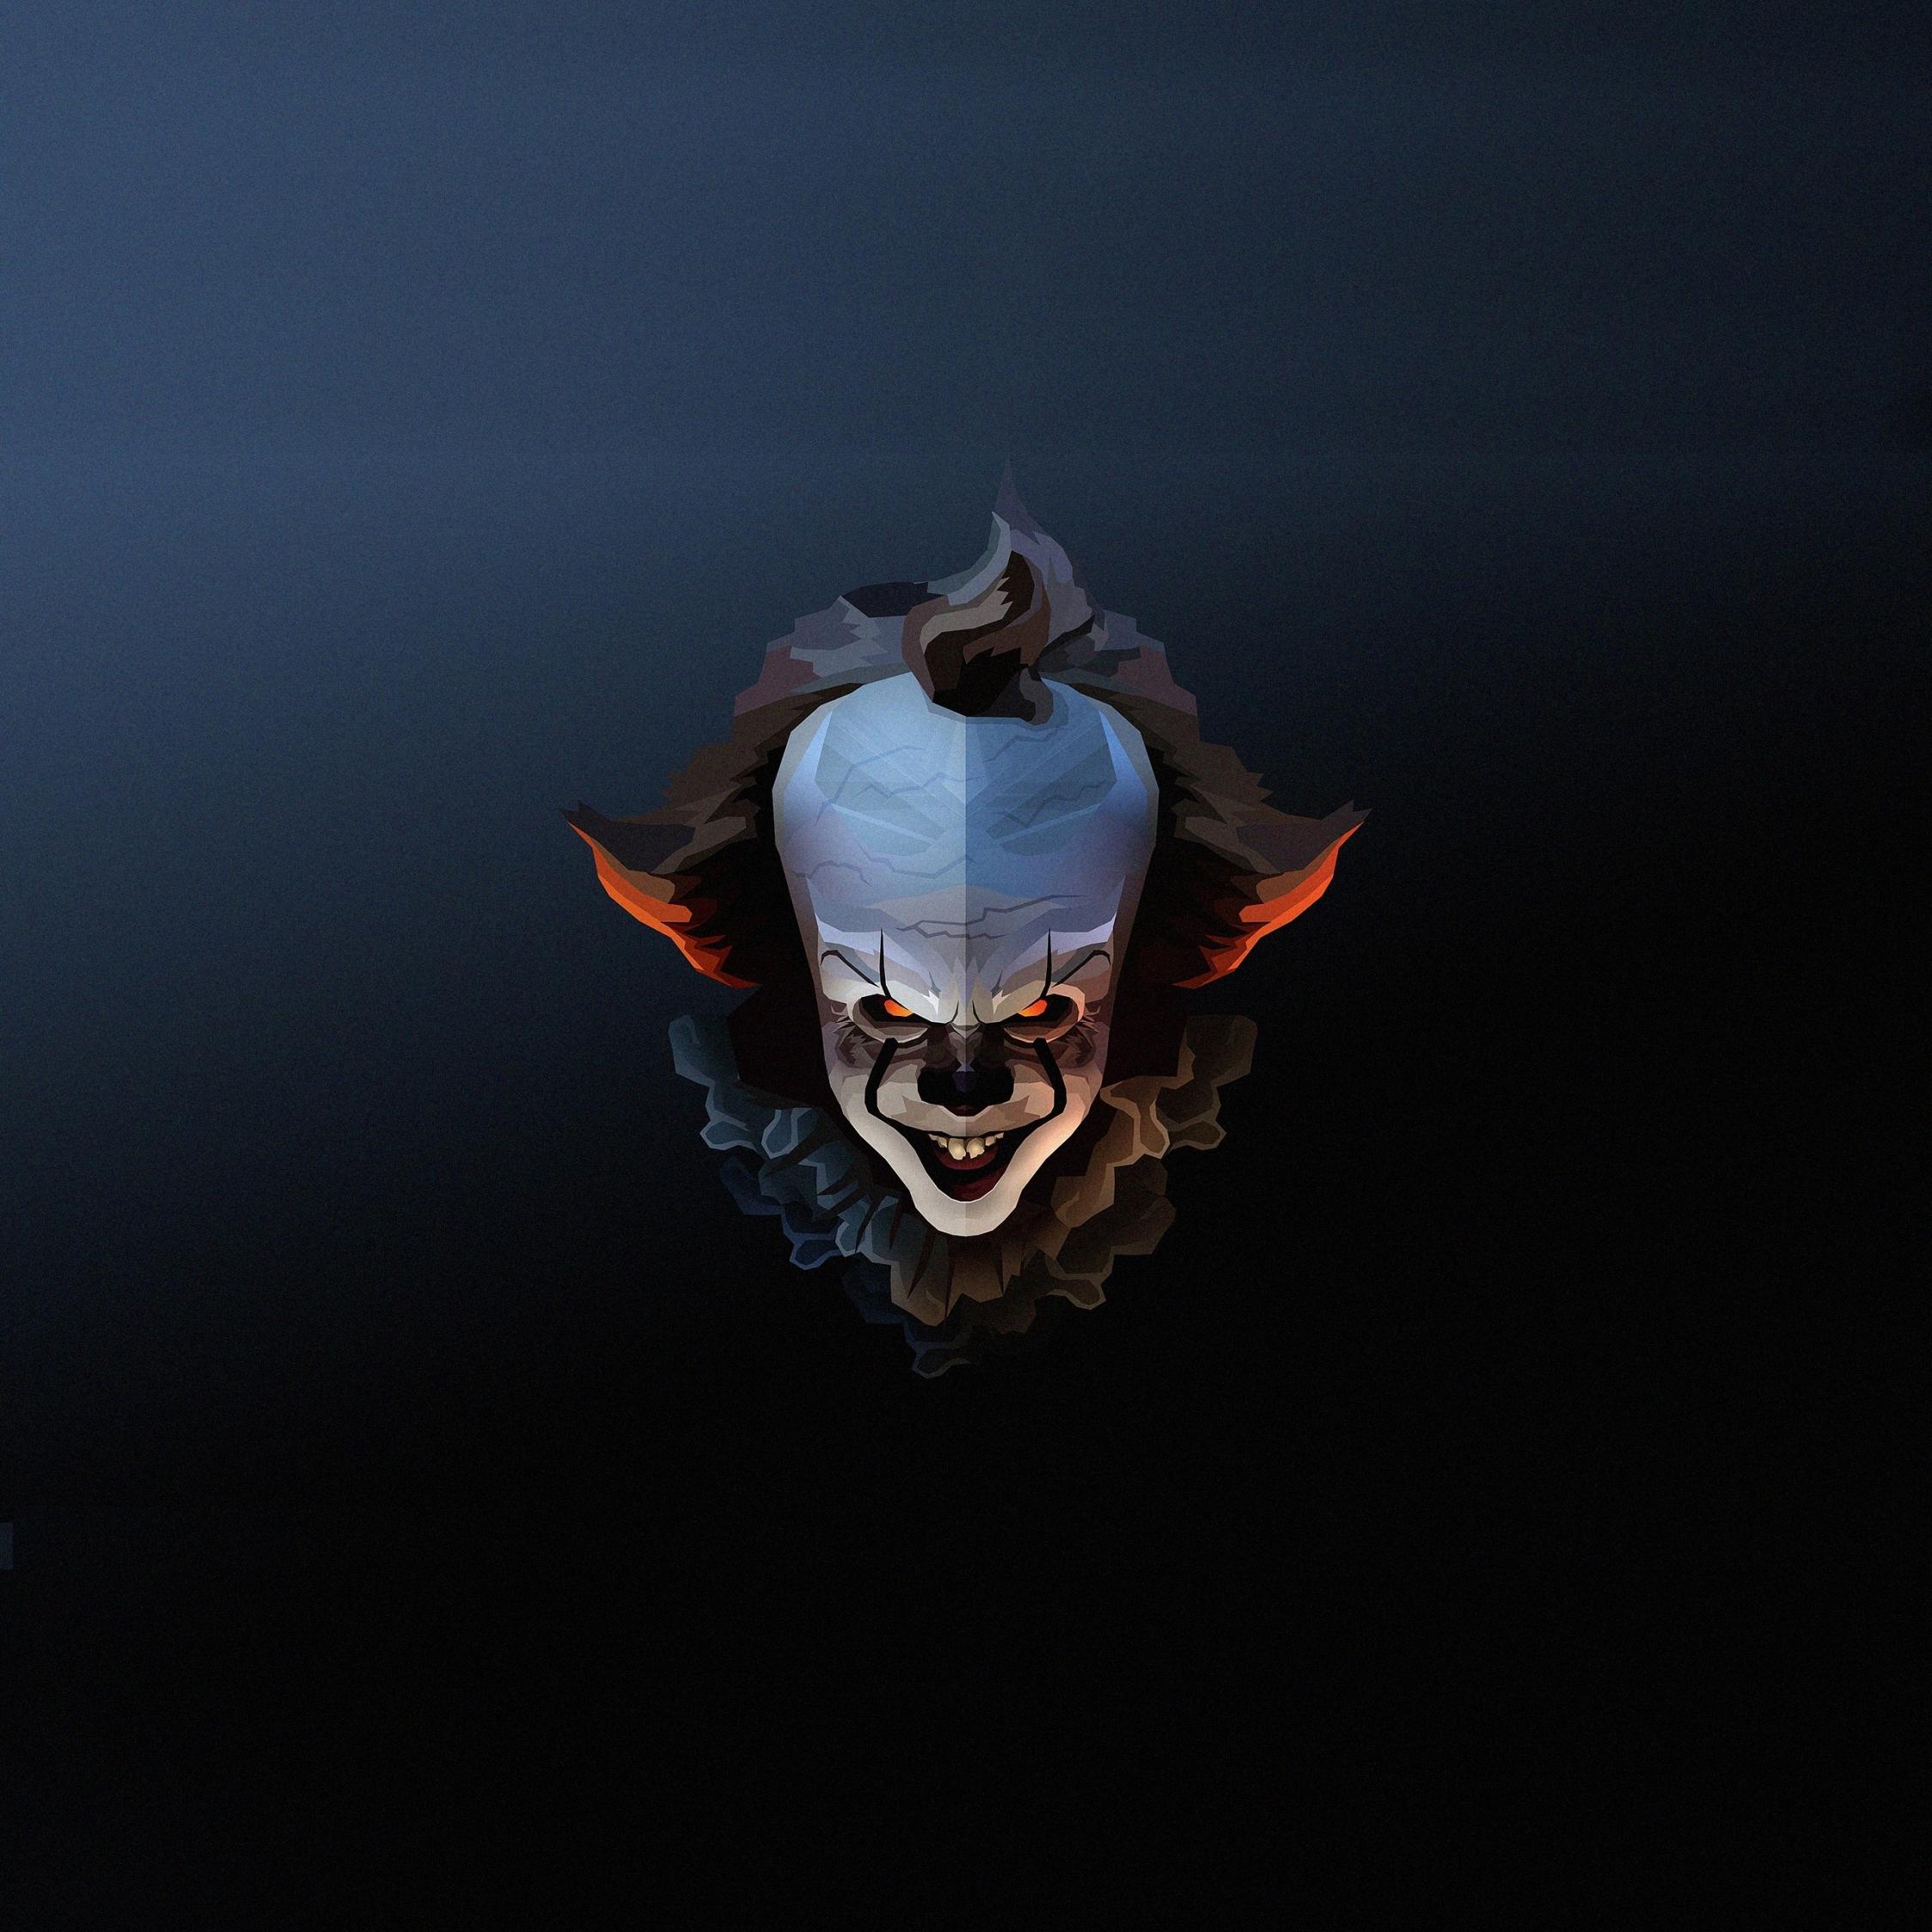 Pennywise, The Clown, halloween, artwork, 2248x2248 wallpaper